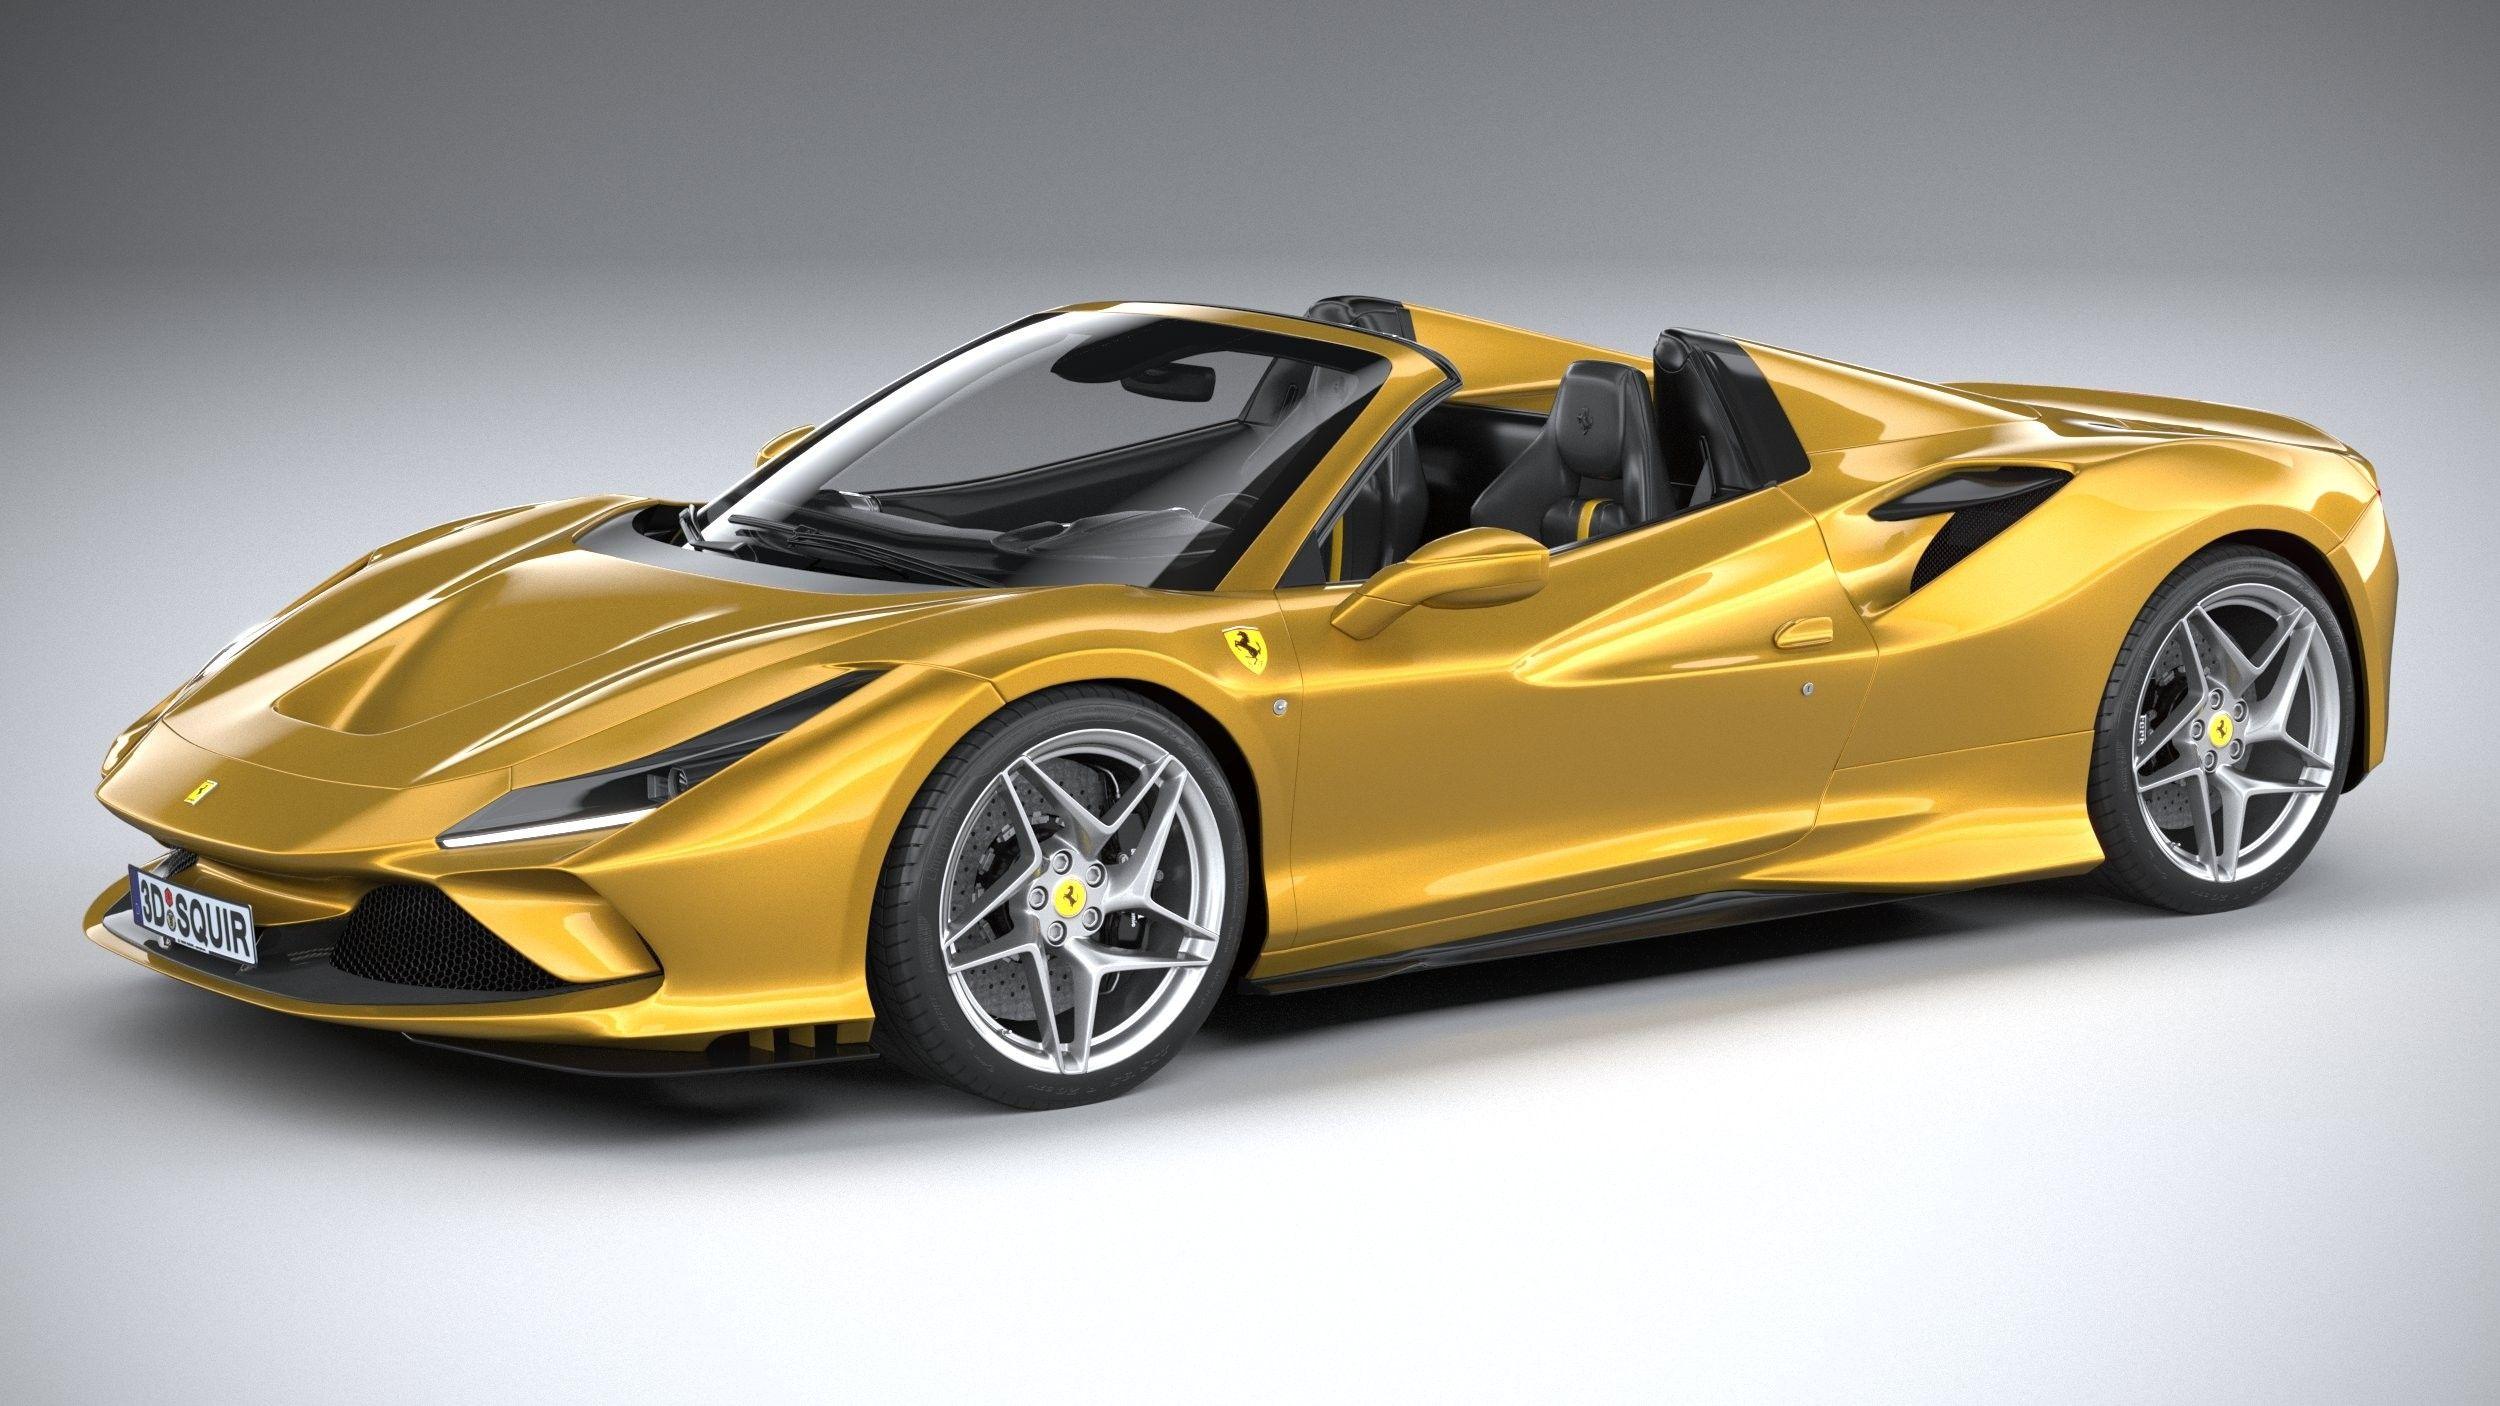 Ferrari F8 Spider 2020 Ferrari Sports Cars Luxury Lamborghini Cars